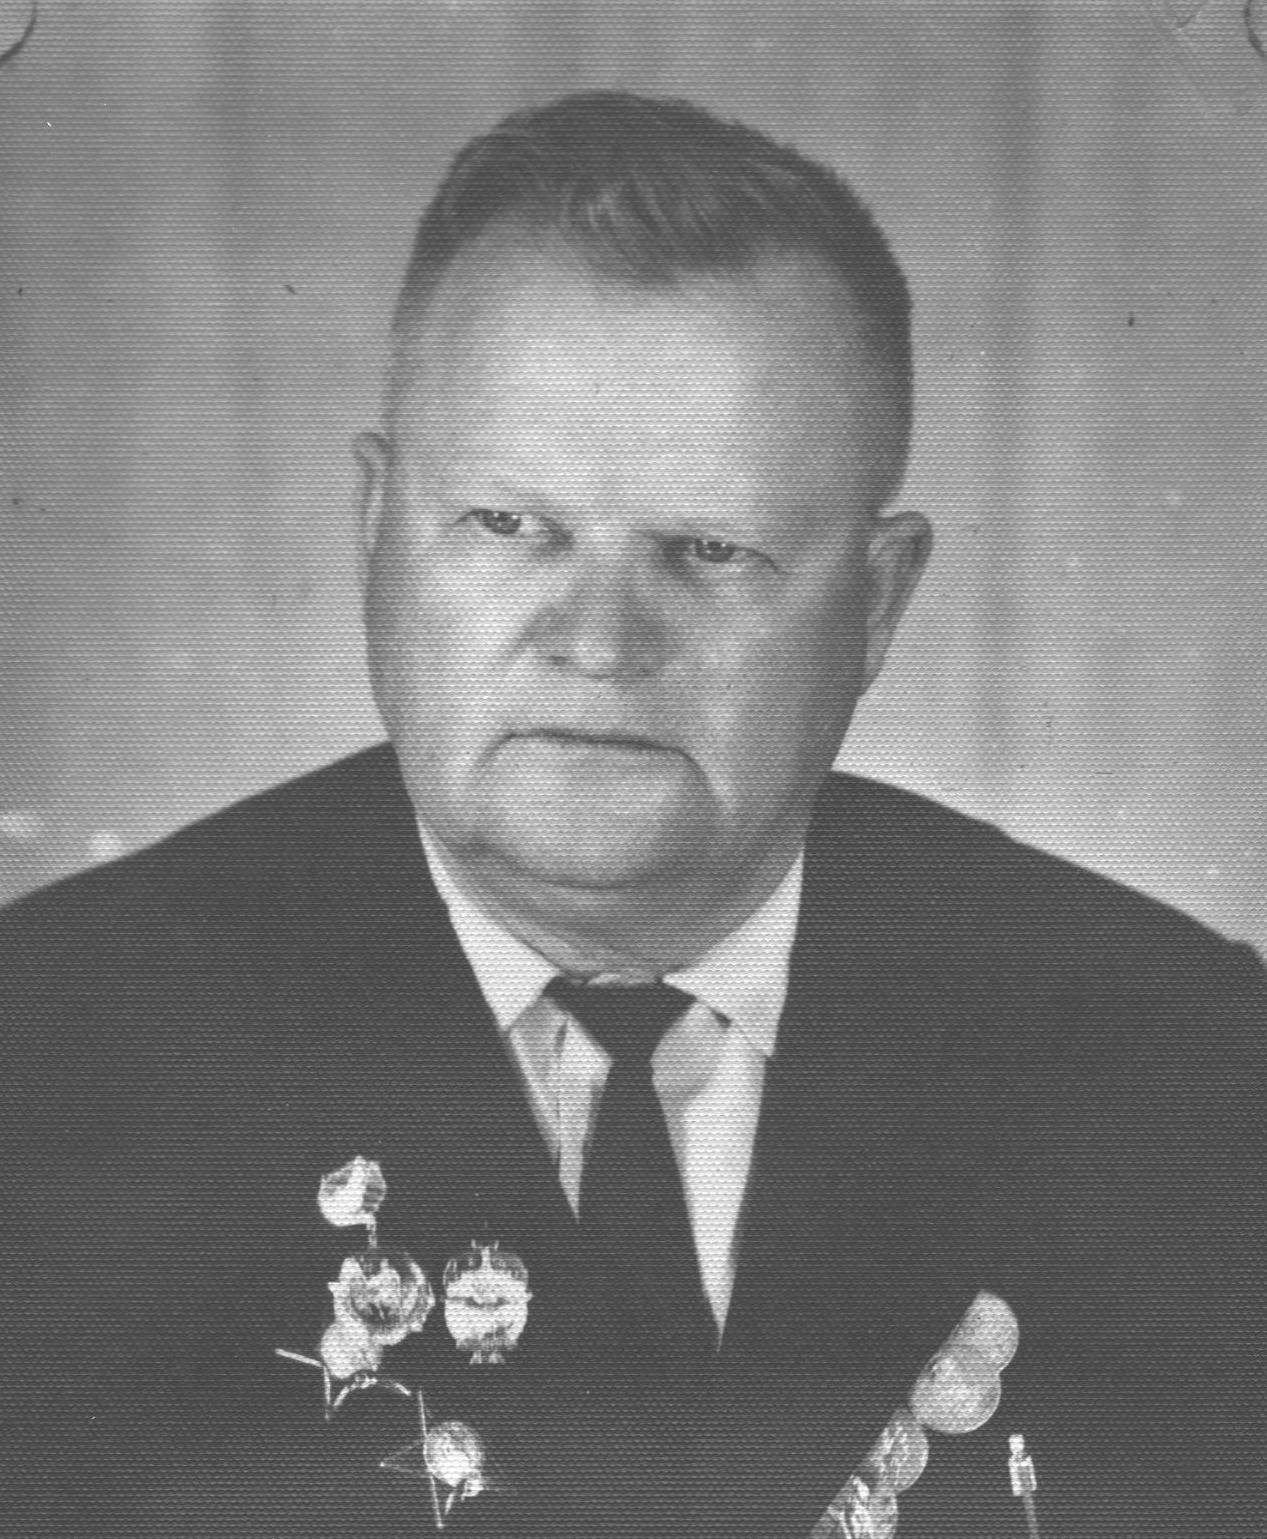 П.Г. Остапец